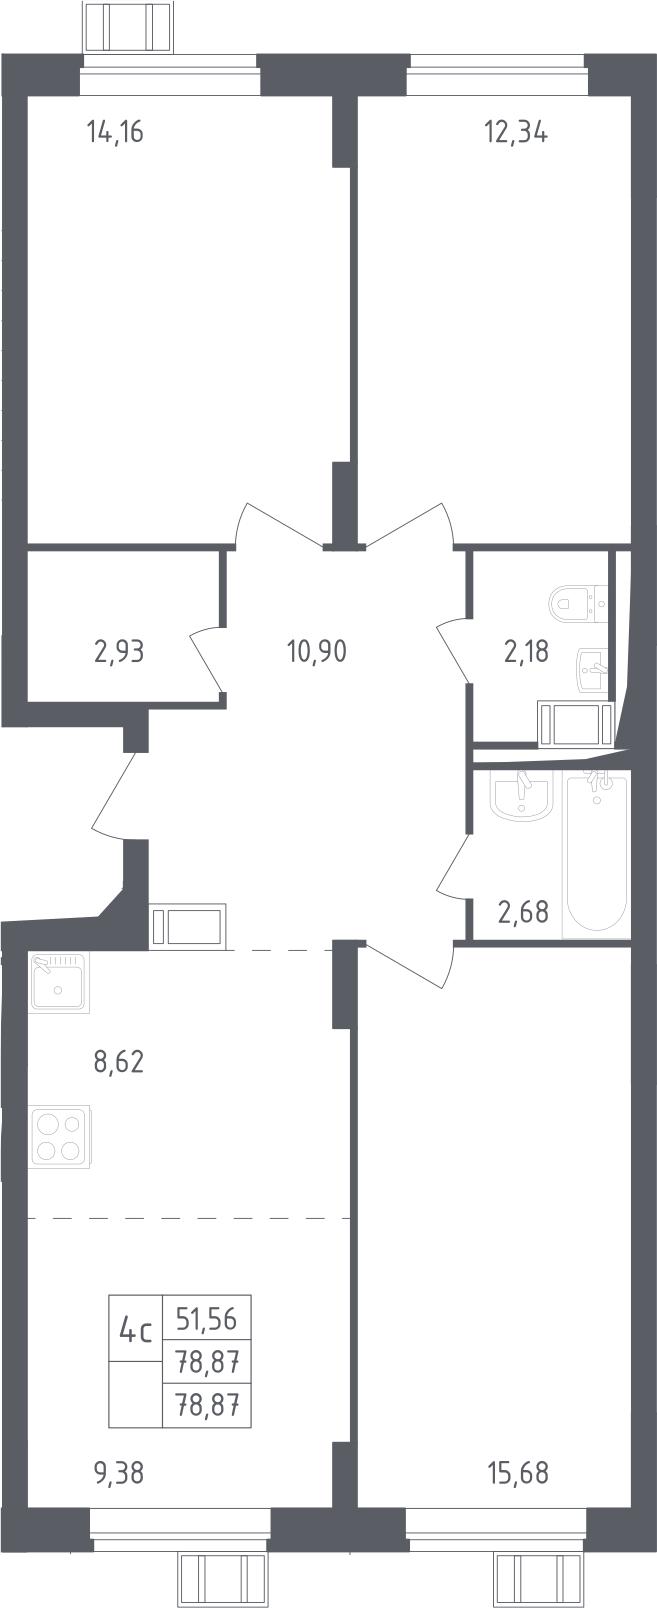 4Е-к.кв, 78.87 м², от 12 этажа